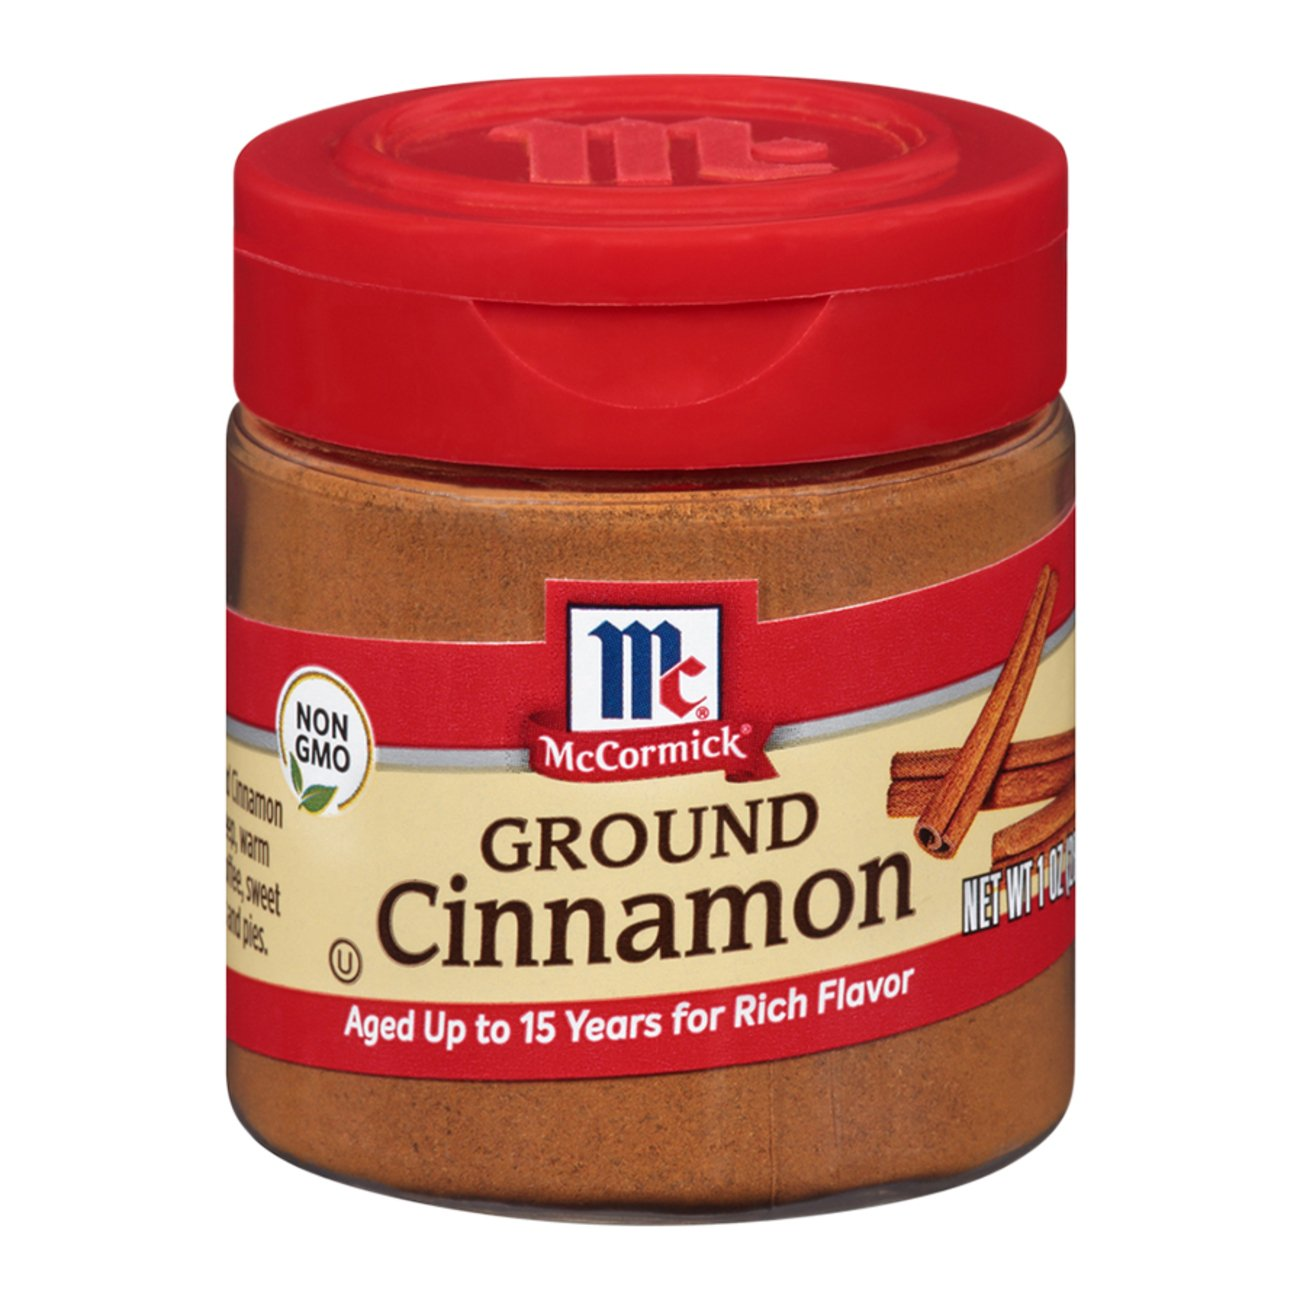 McCormick Ground Cinnamon - Shop Herbs